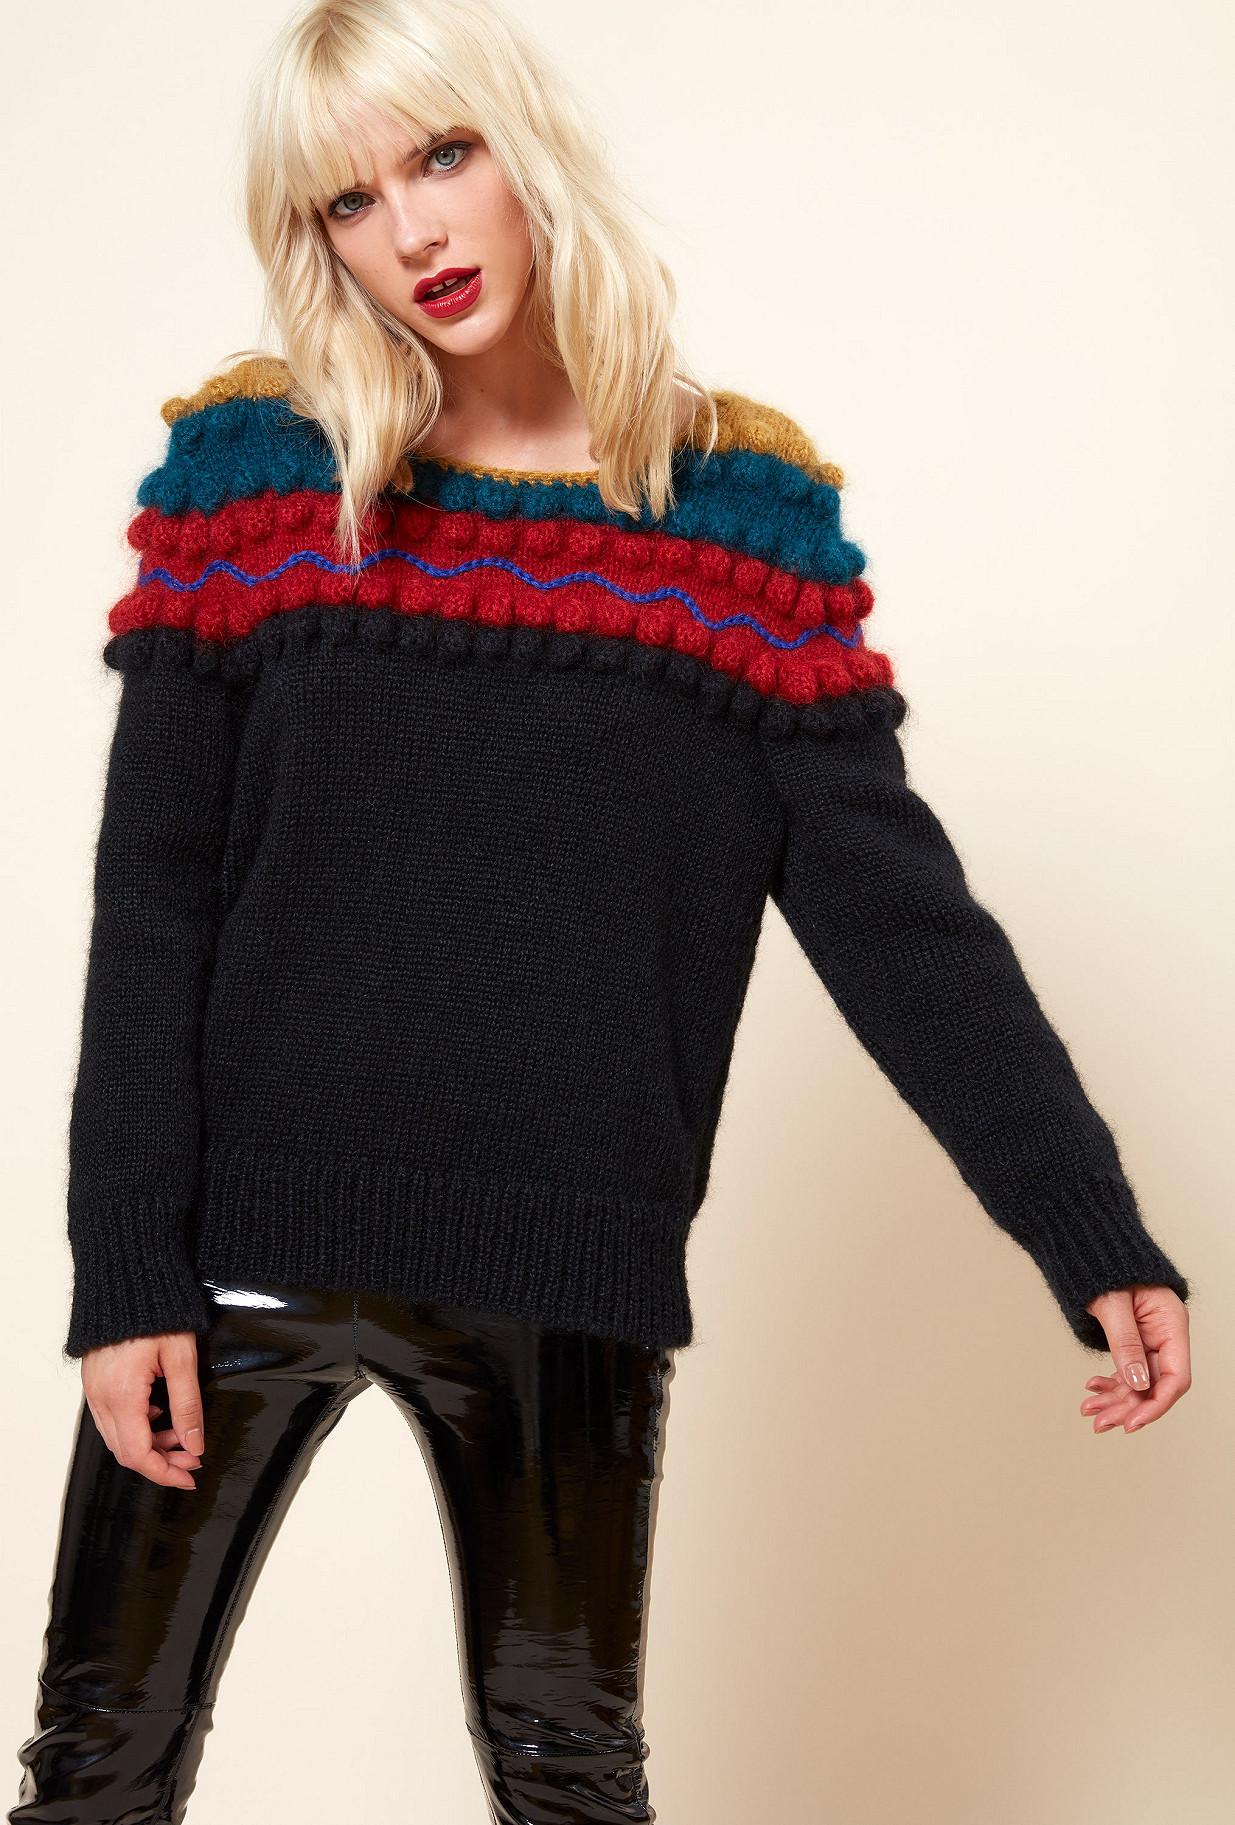 Paris clothes store Knit  Manitas french designer fashion Paris